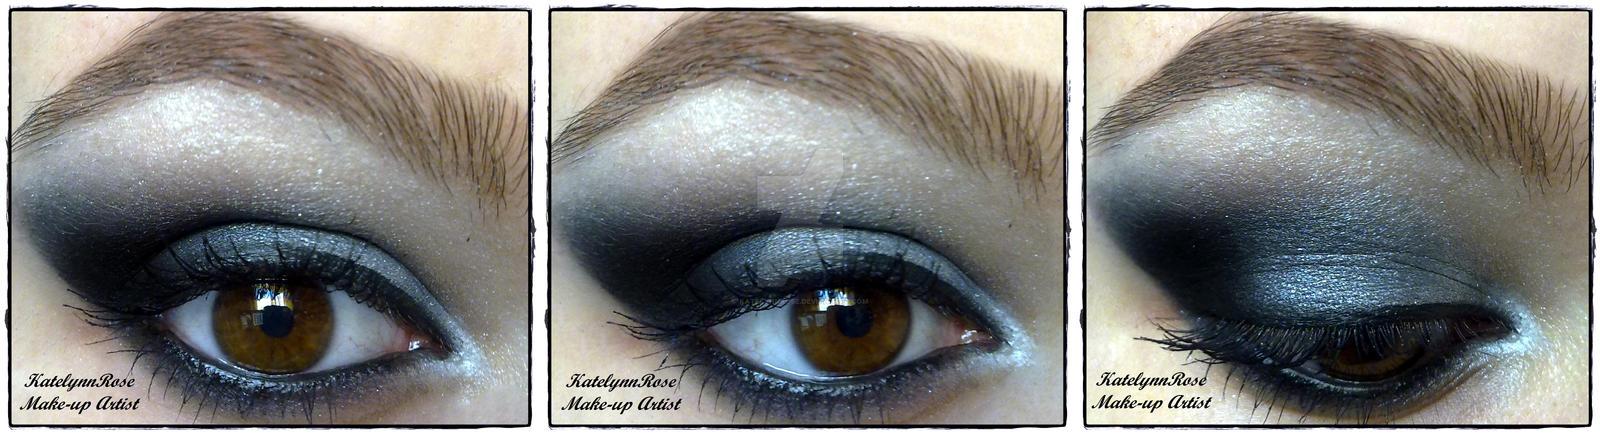 winged smokey eye look by KatelynnRose